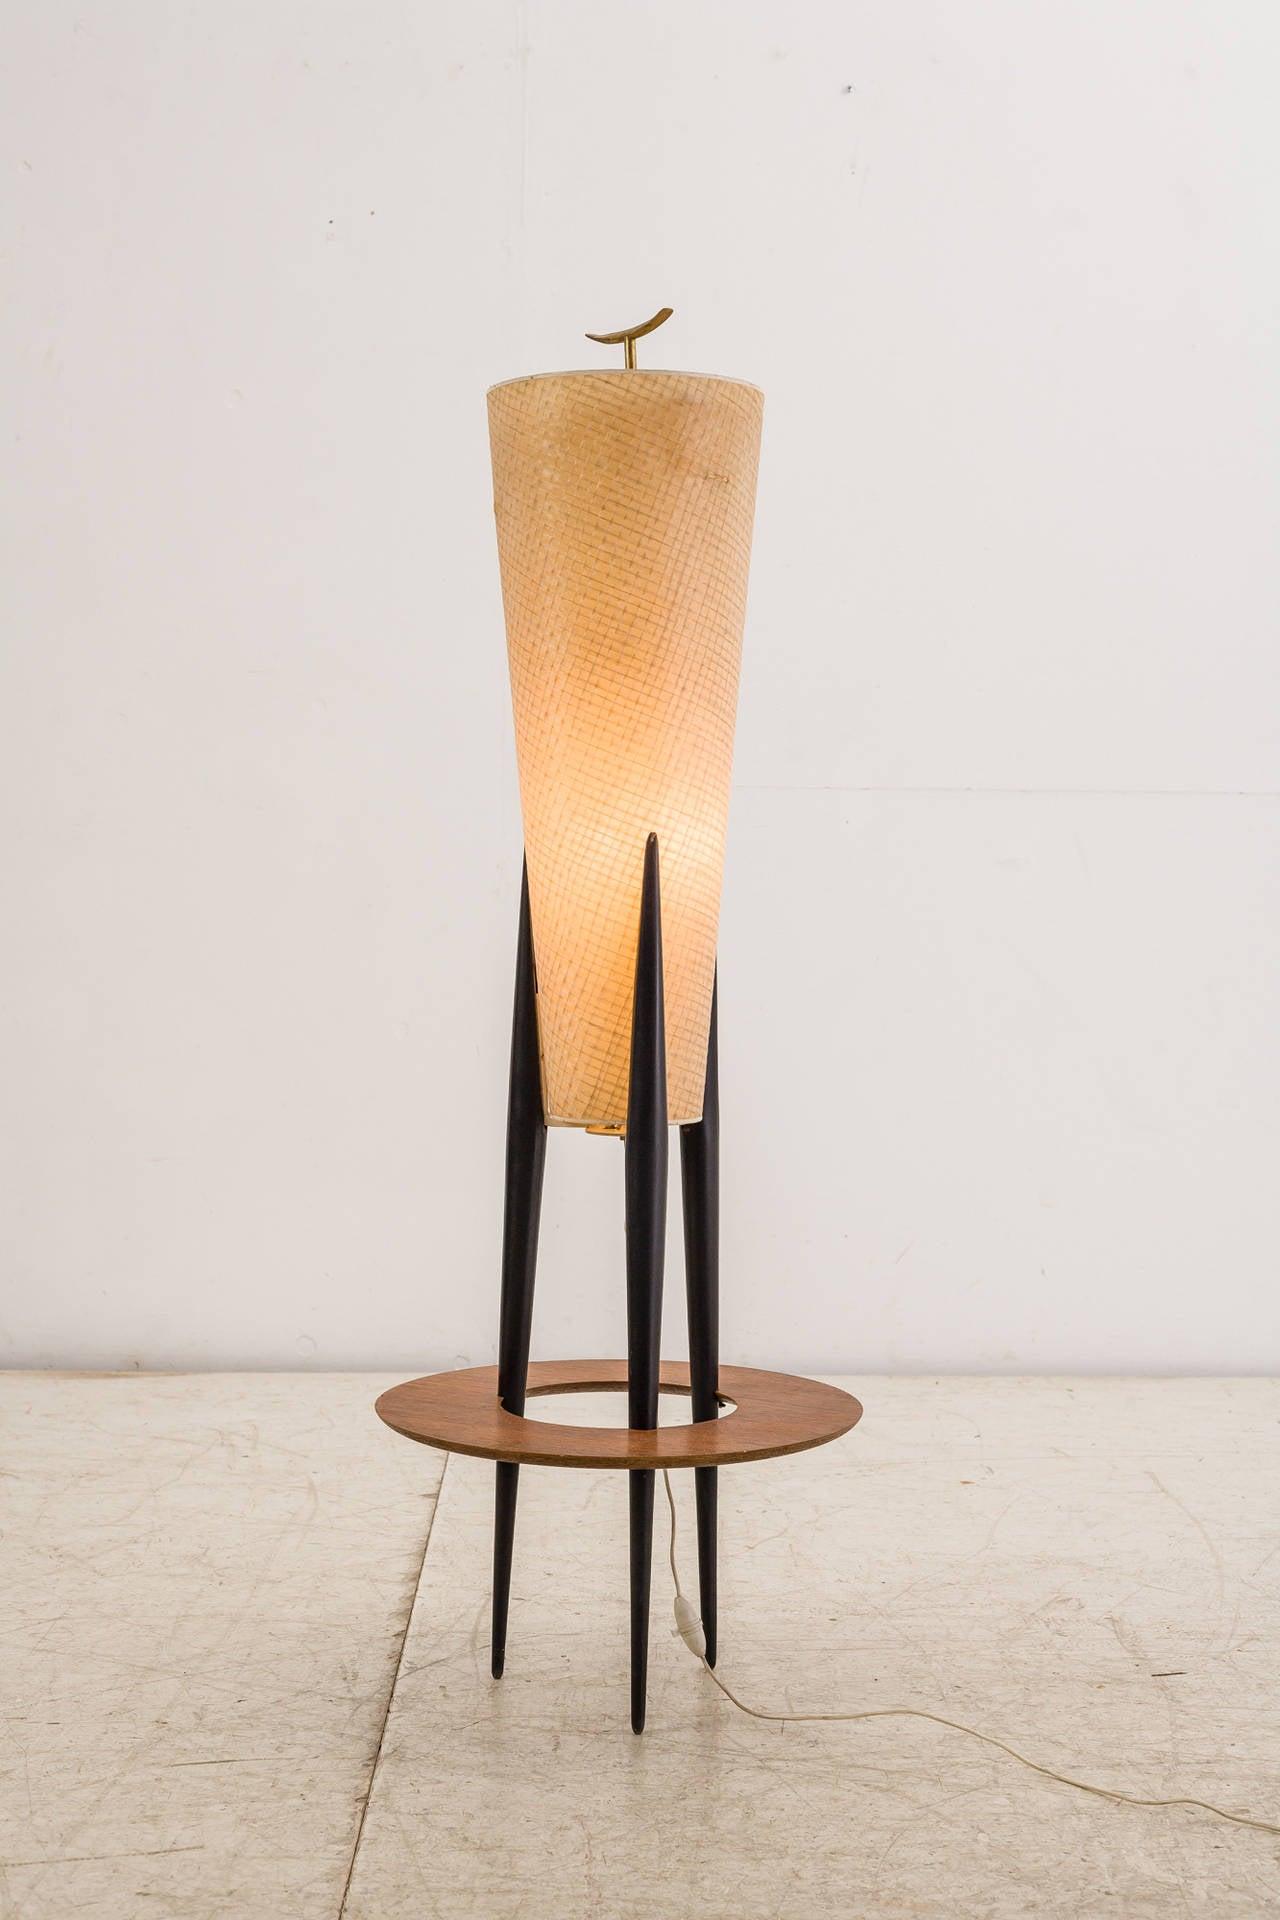 rare three legged rispal floor lamp france 1950s for sale at 1stdibs. Black Bedroom Furniture Sets. Home Design Ideas